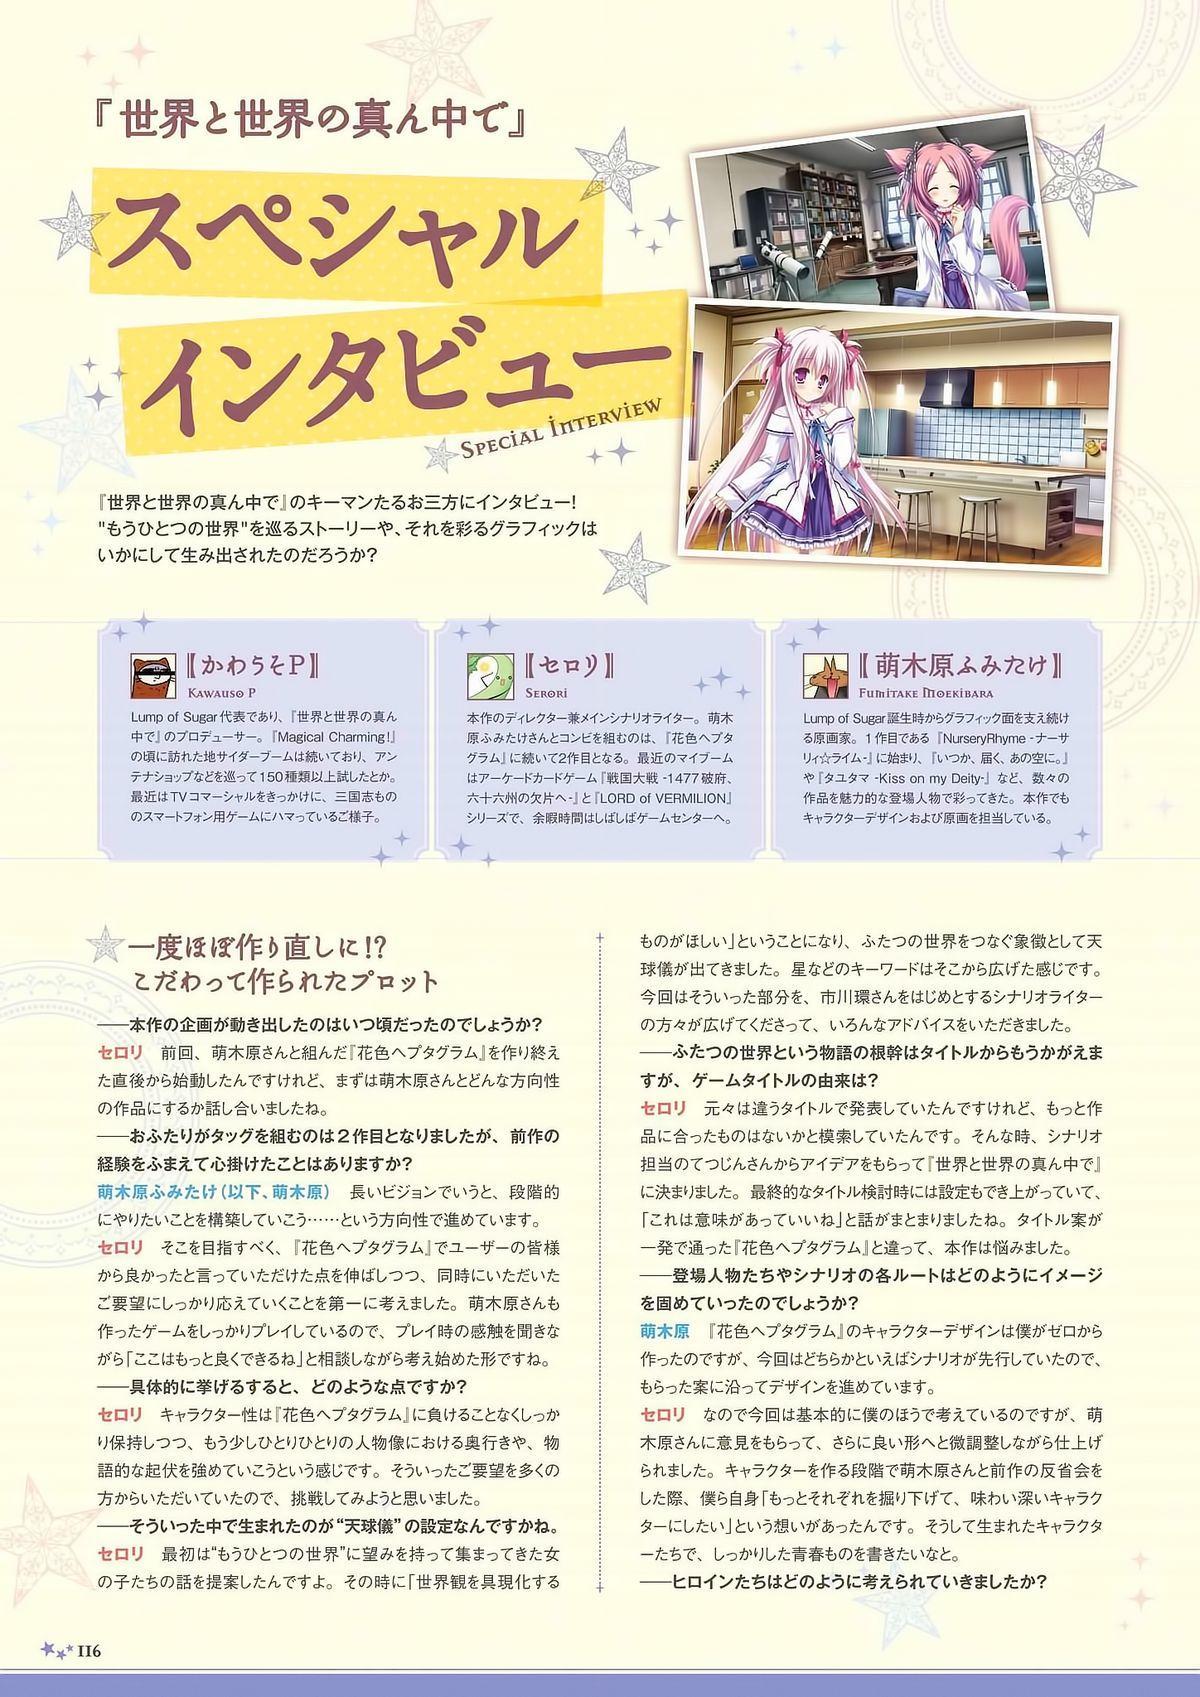 Sekai to Sekai no Mannaka de Visual Fanbook 113